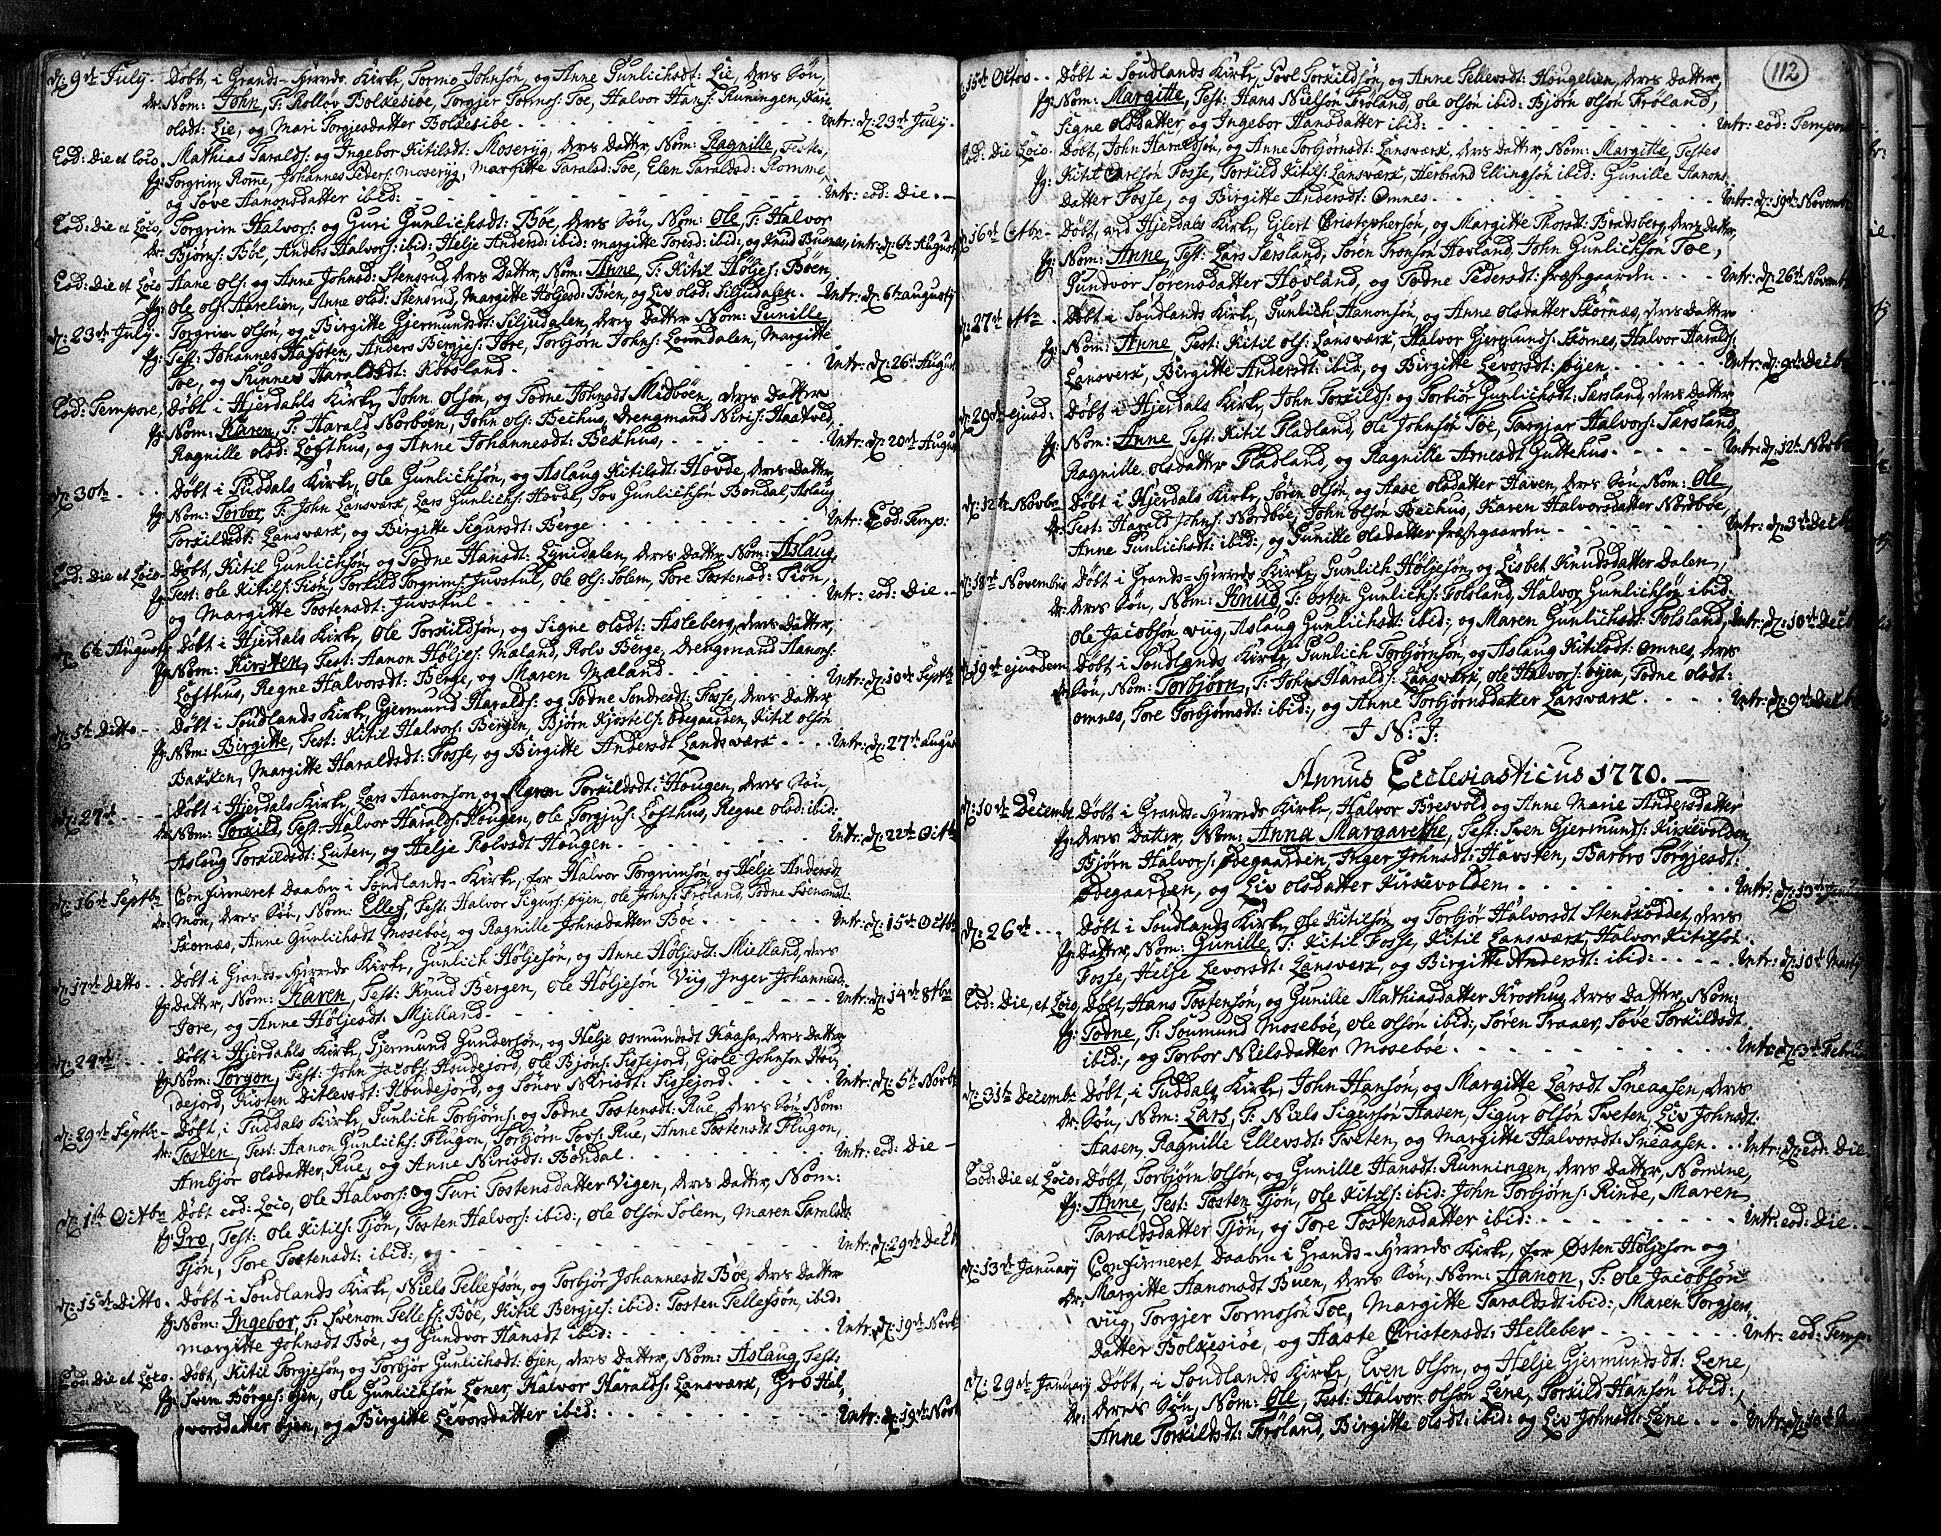 SAKO, Hjartdal kirkebøker, F/Fa/L0003: Ministerialbok nr. I 3, 1727-1775, s. 112